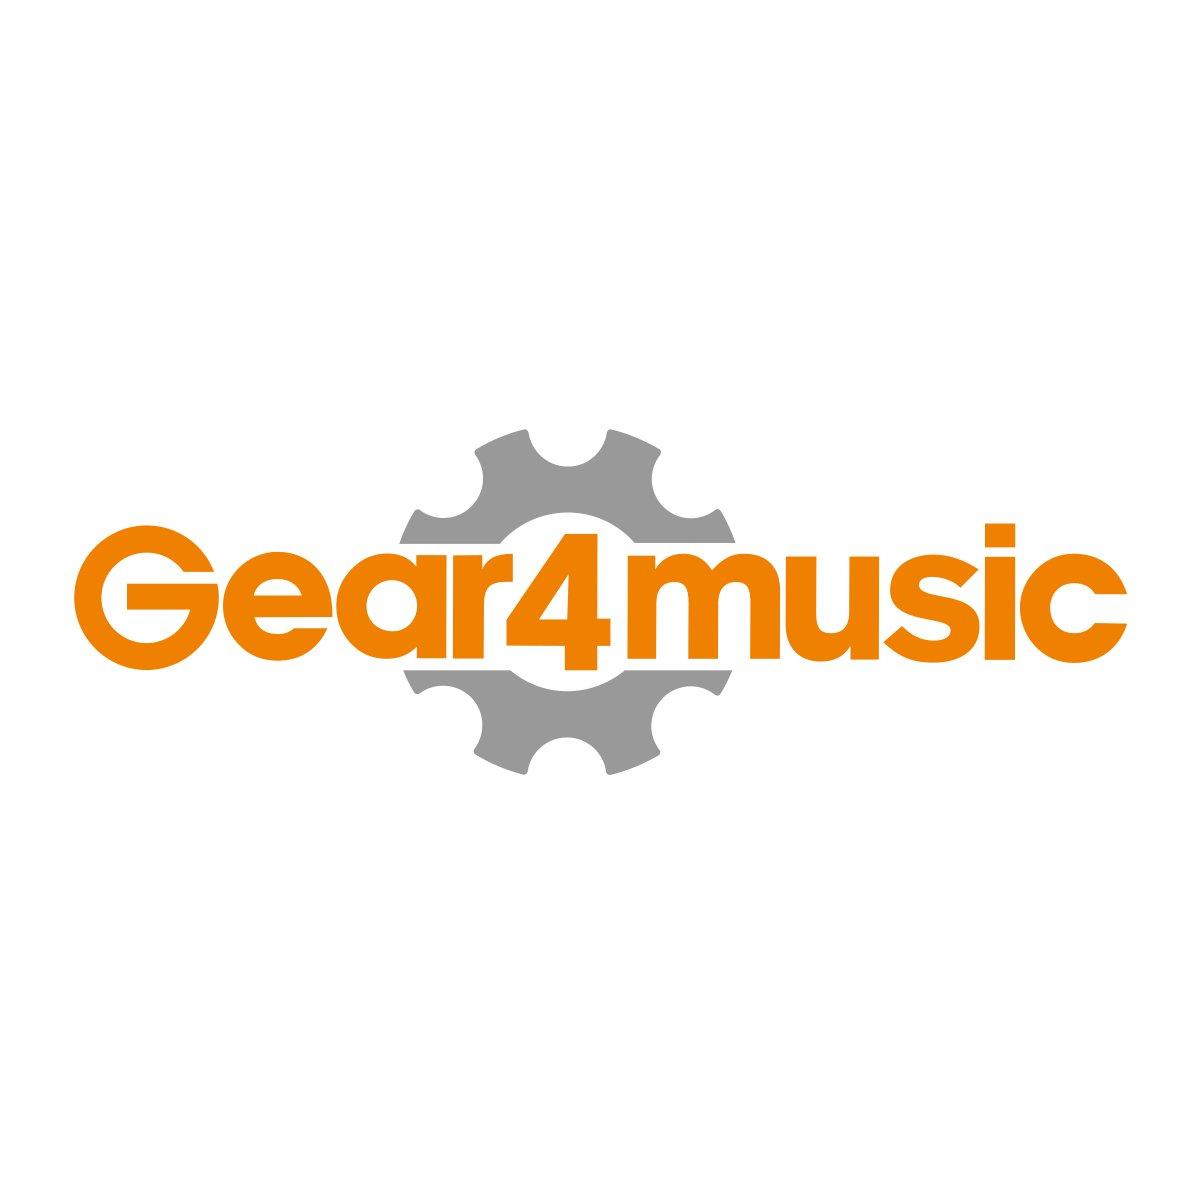 subzero generation 8 jet black sz sa15 amp pack at gear4music. Black Bedroom Furniture Sets. Home Design Ideas